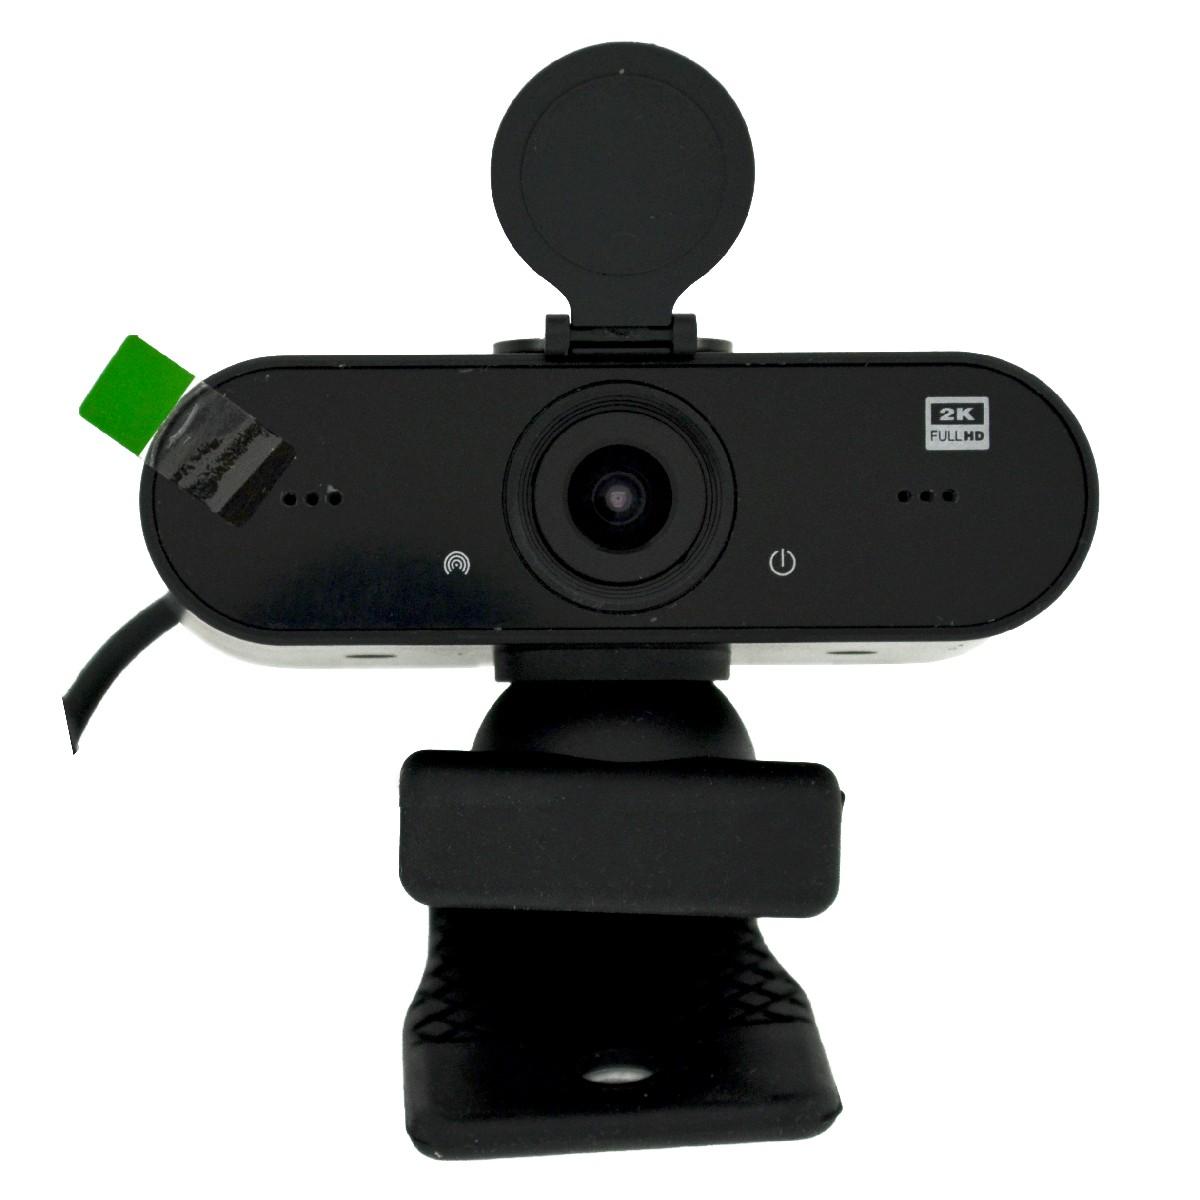 USB Webcam Mobilis H5 Full HD 2K 2560X1440 με Ενσωματωμένο Μικρόφωνο και Υψηλή Ανάλυση. Μαύρη